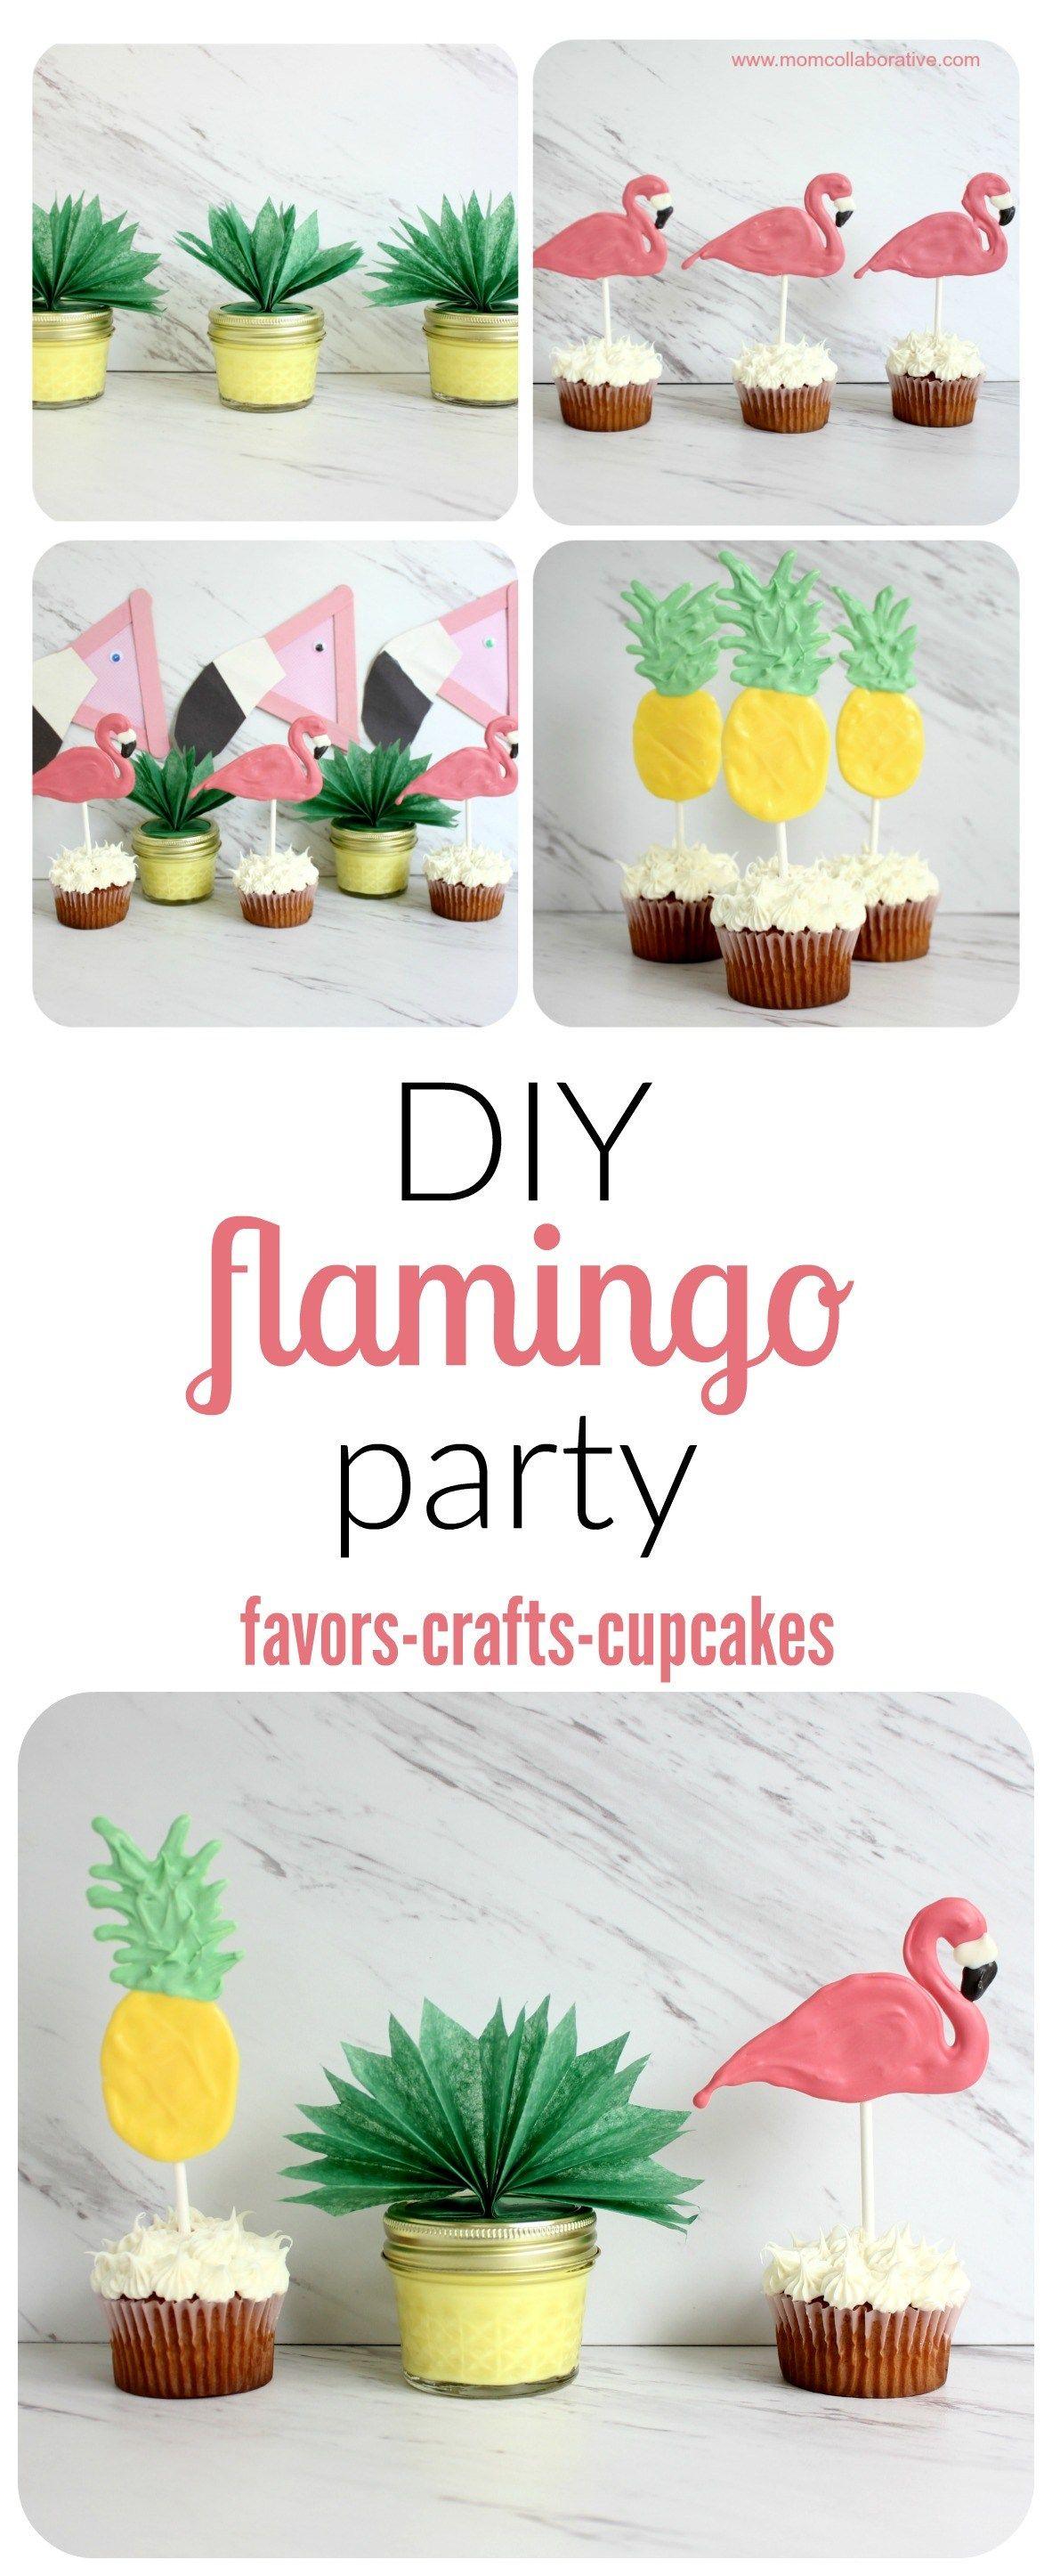 Four Simple Flamingo Party DIY Ideas   Flamingo party, Flamingo and ...